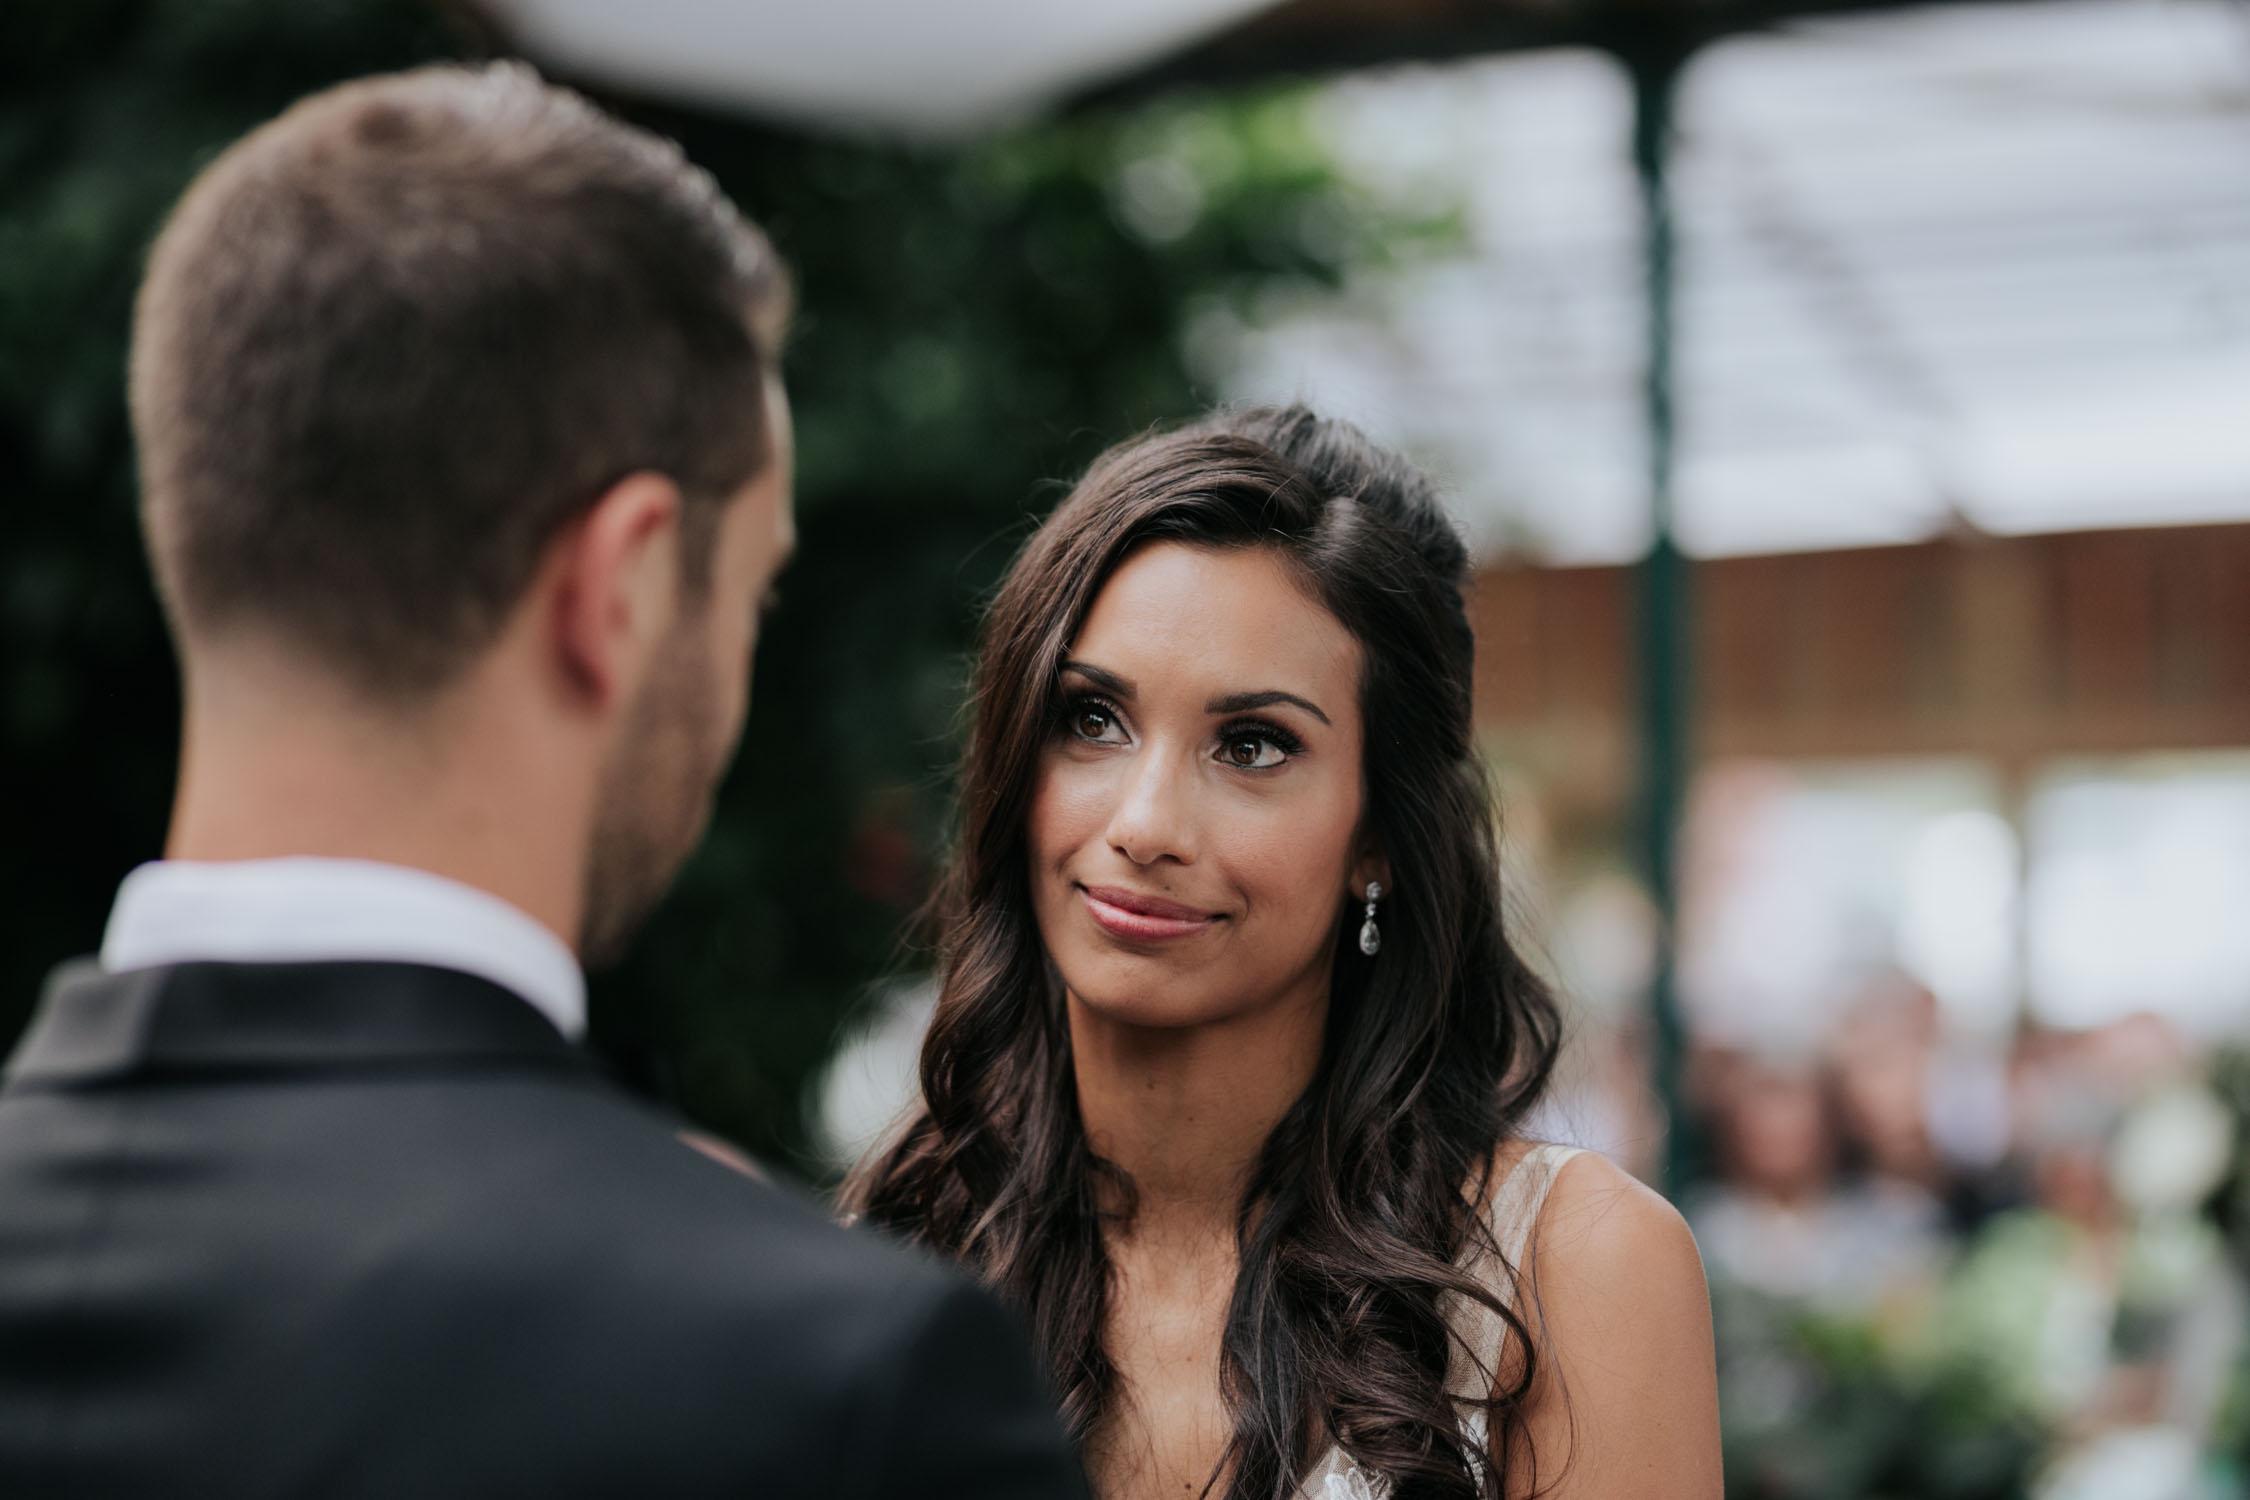 Romantic non cheesy wedding photographer at Madsen's Greenhouse wedding venue in Newmarket close to Toronto